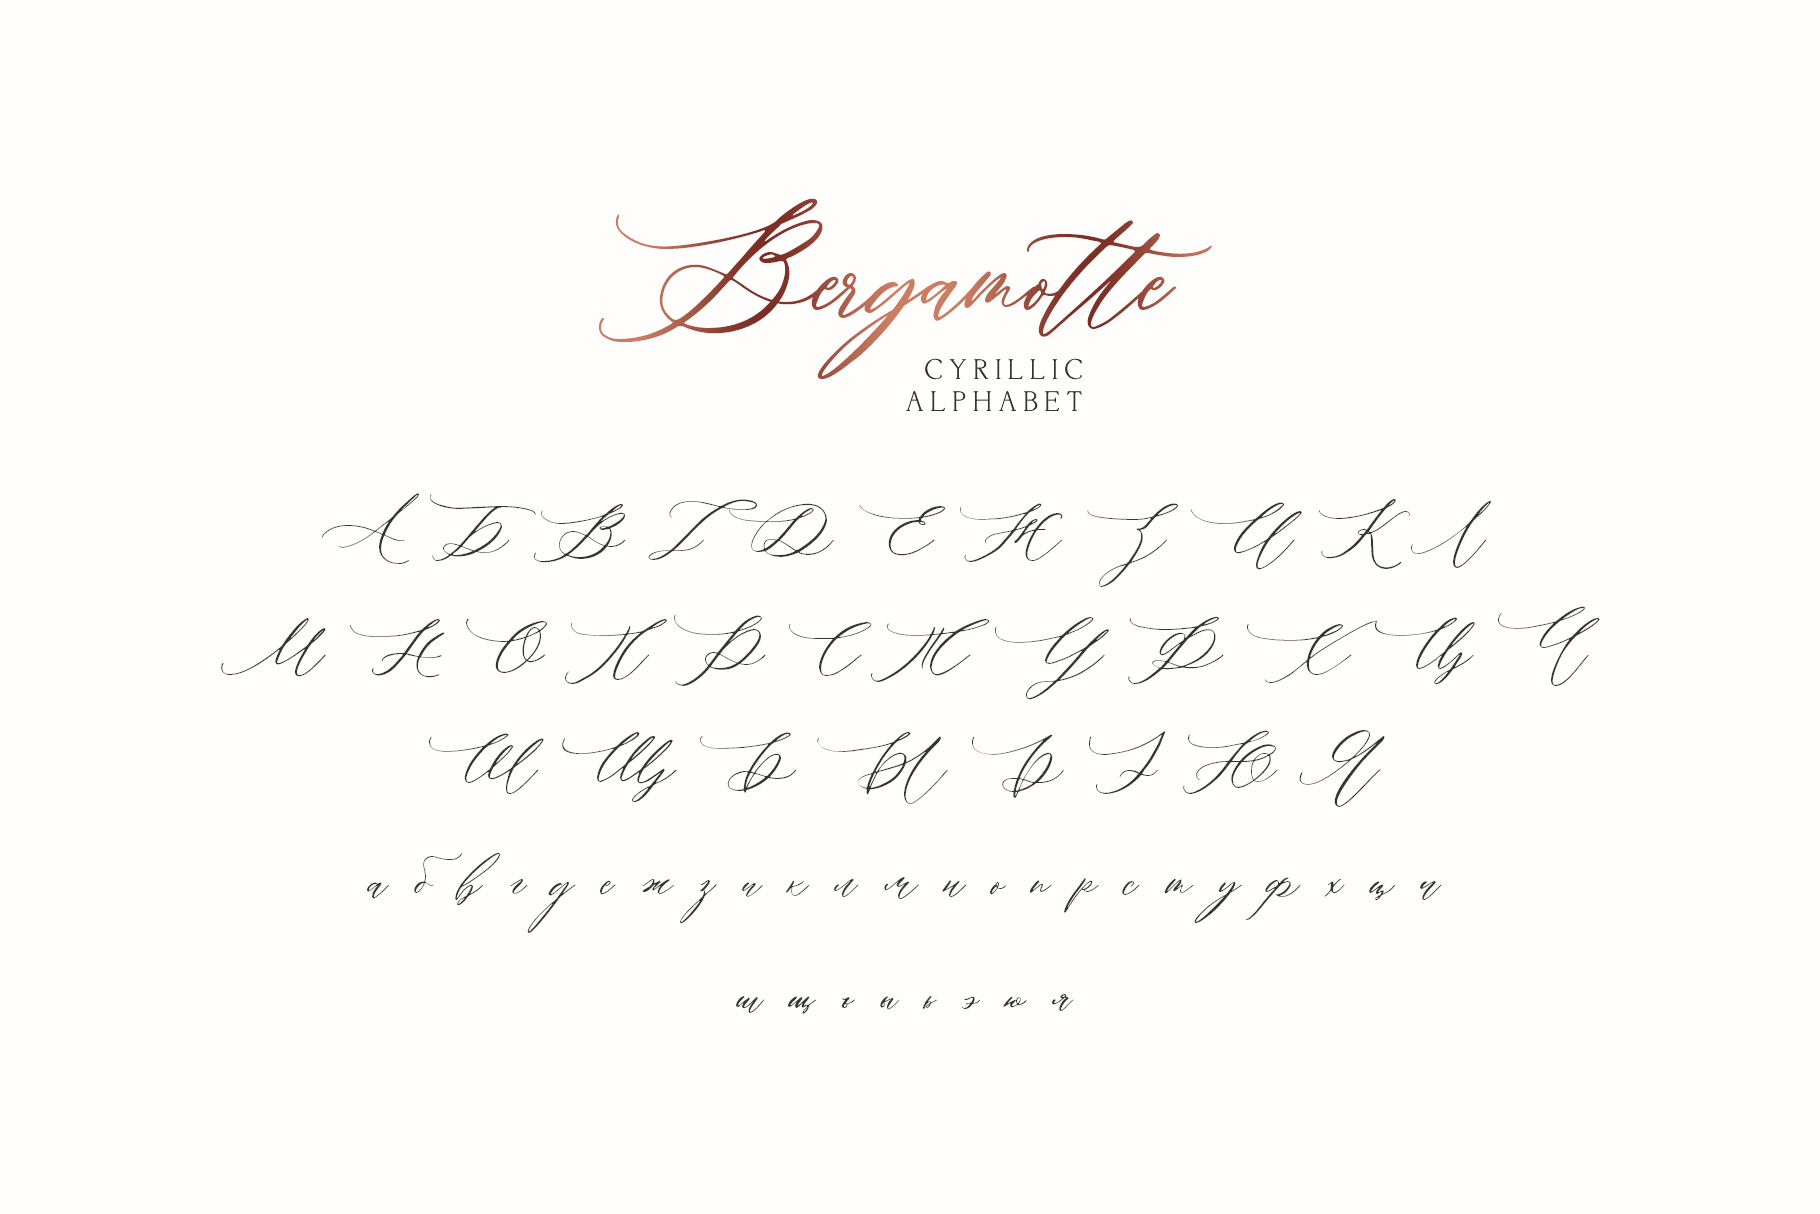 Bergamotte - Fine Art Calligraphy example image 9